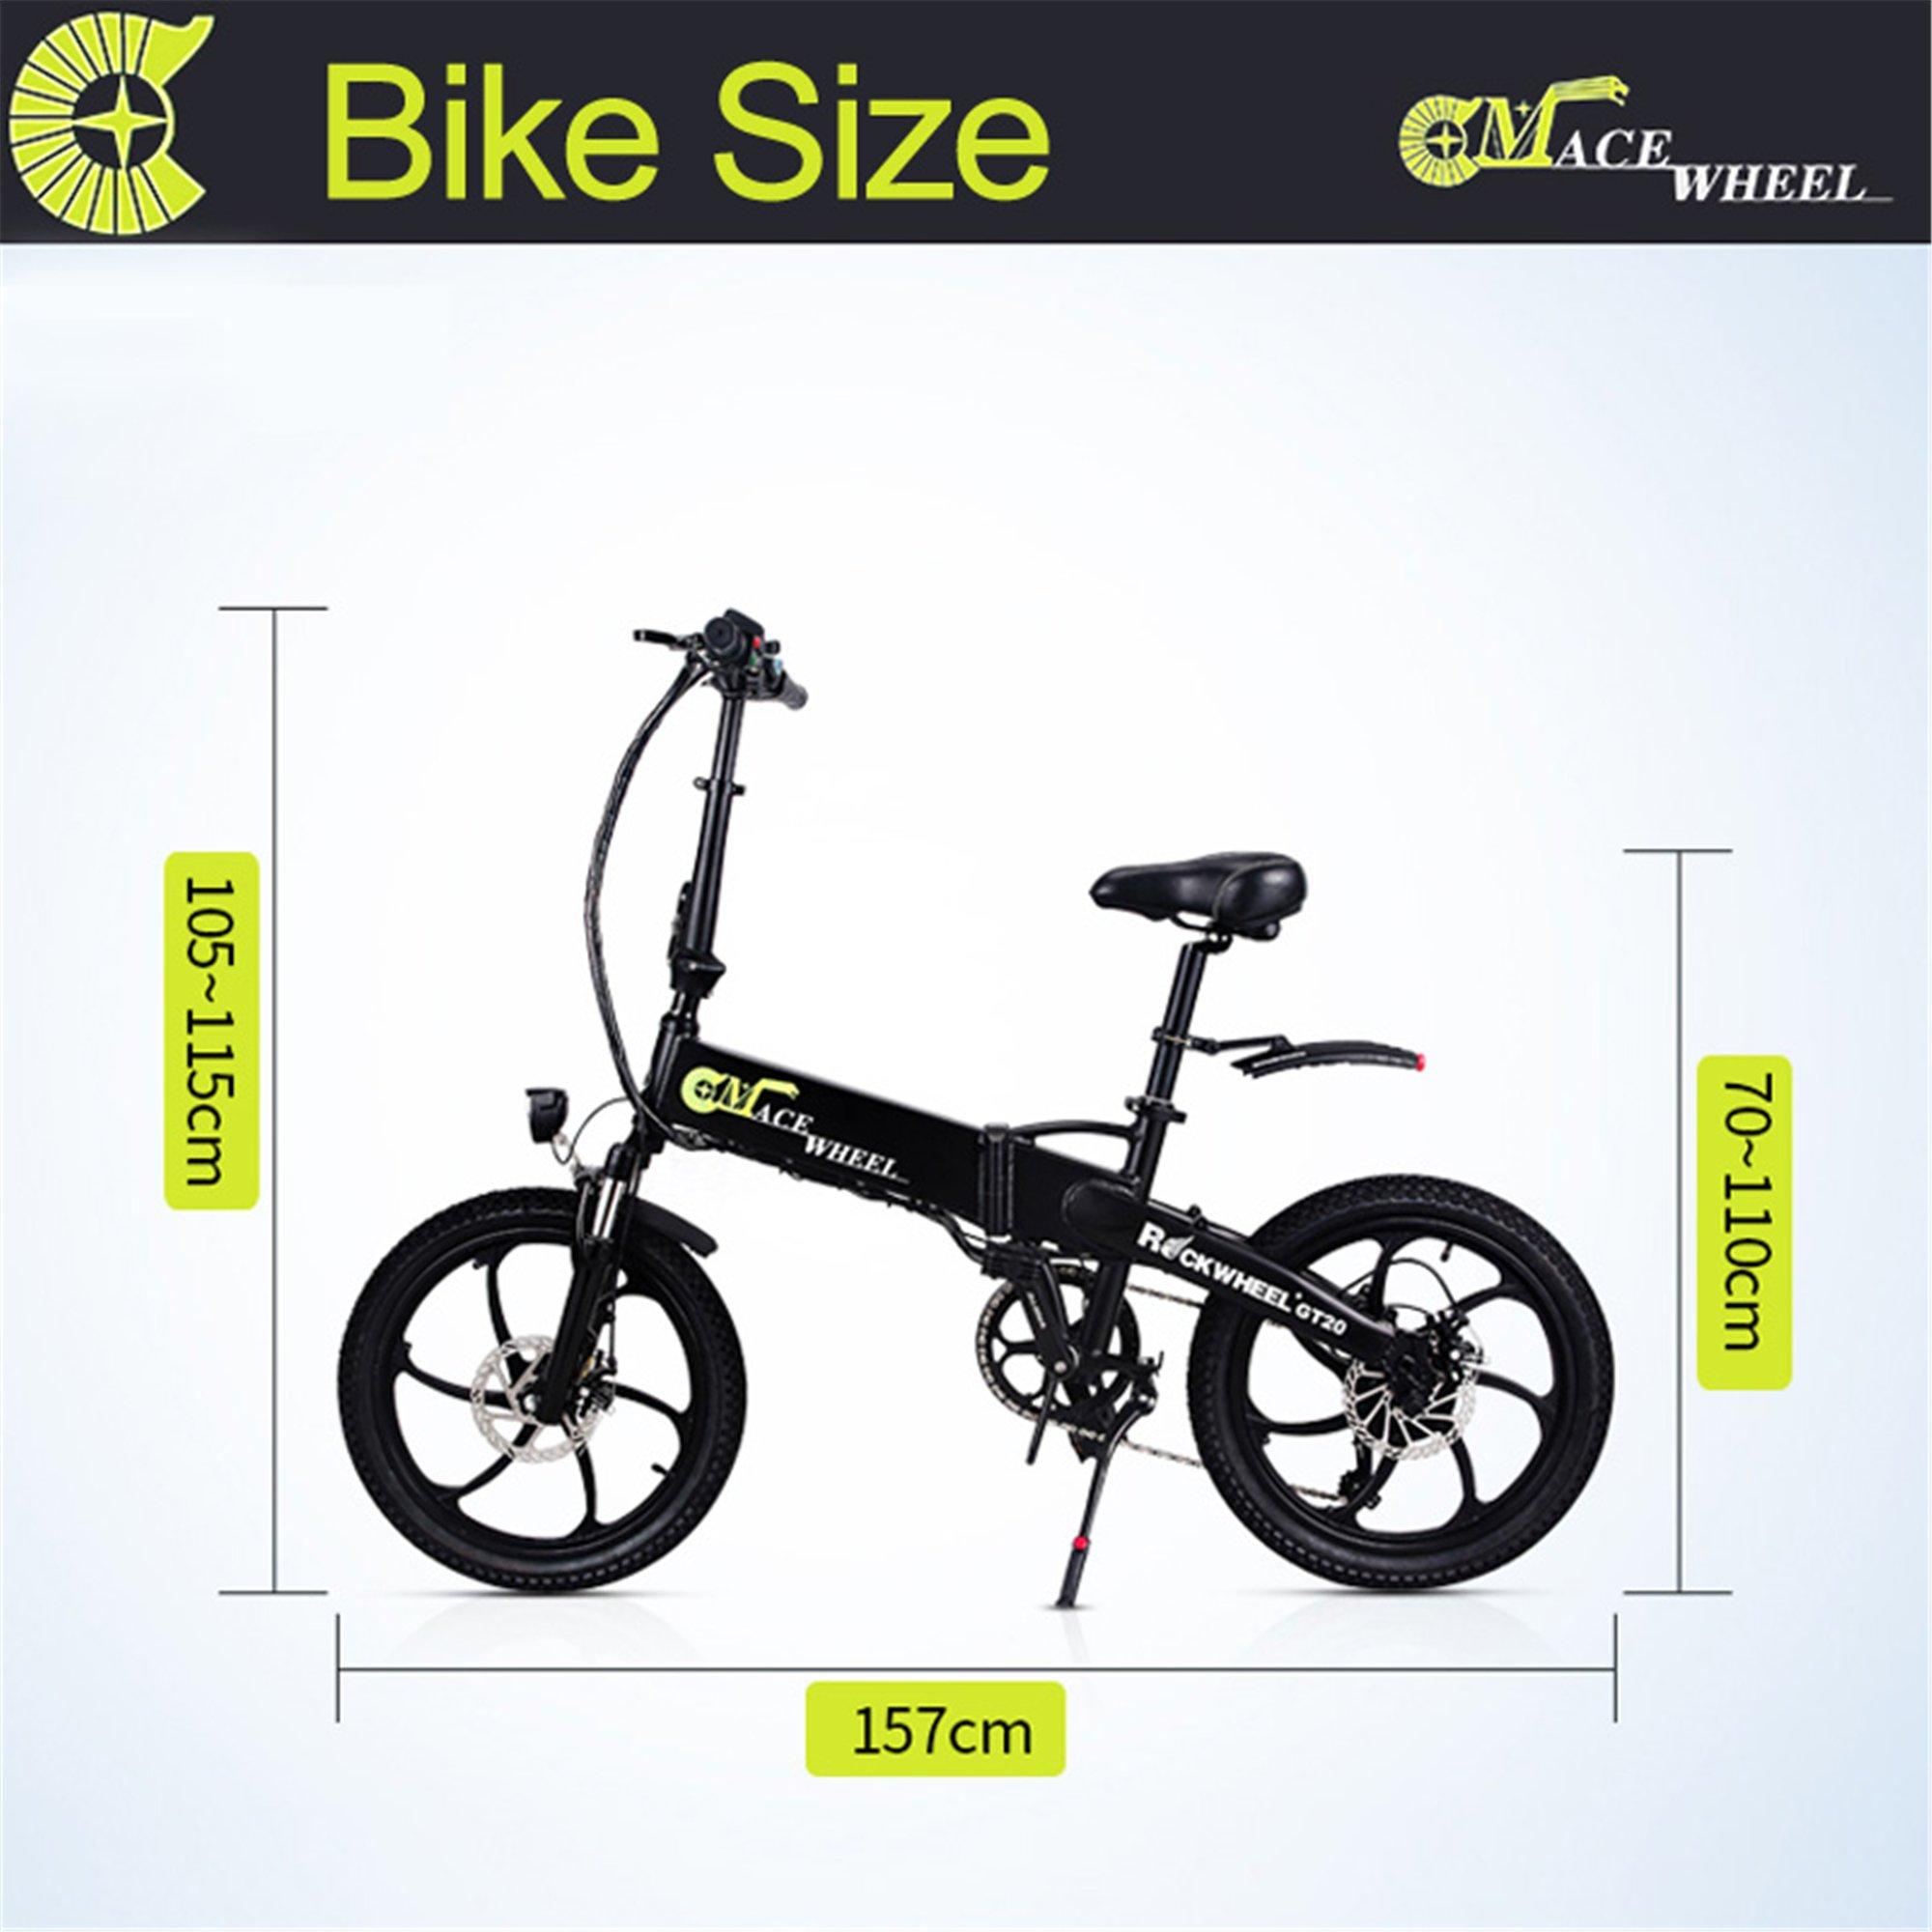 4a888bd6fbe Rockwheel GT20 48V 350W Folding Bike 20 inch Electric Mountain ...